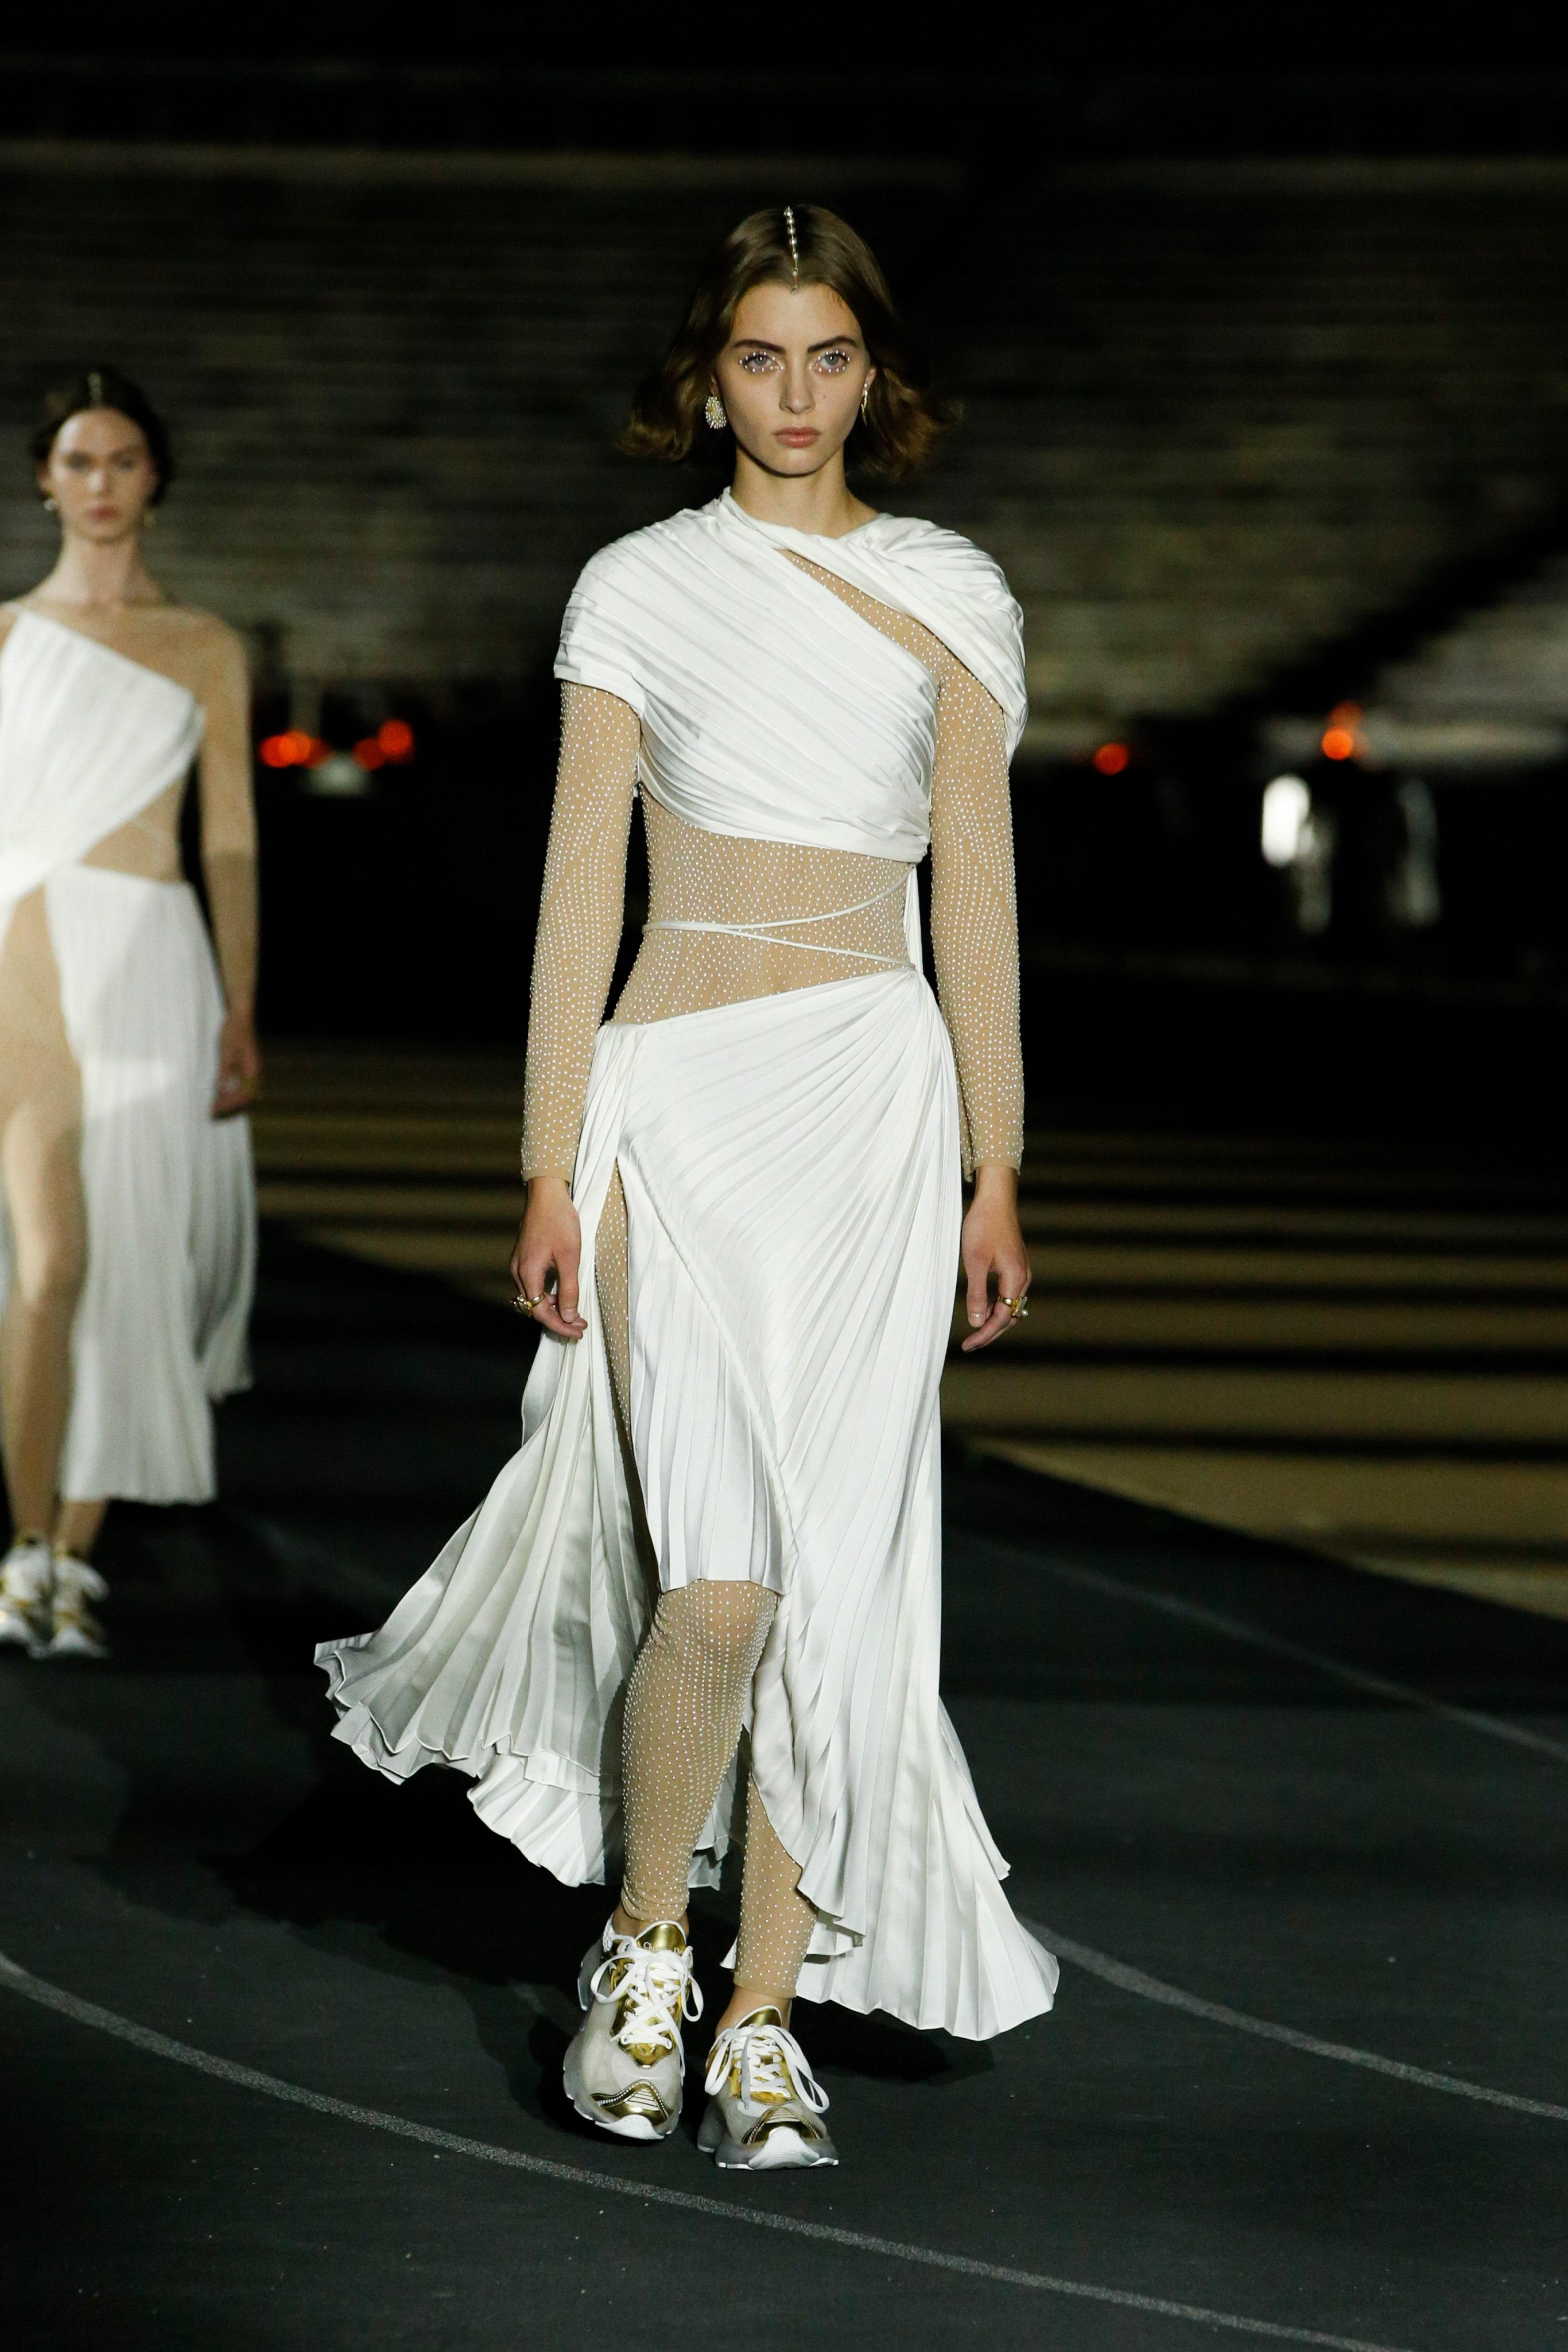 00035-Dior-Resort-2022-credit-brand.jpeg